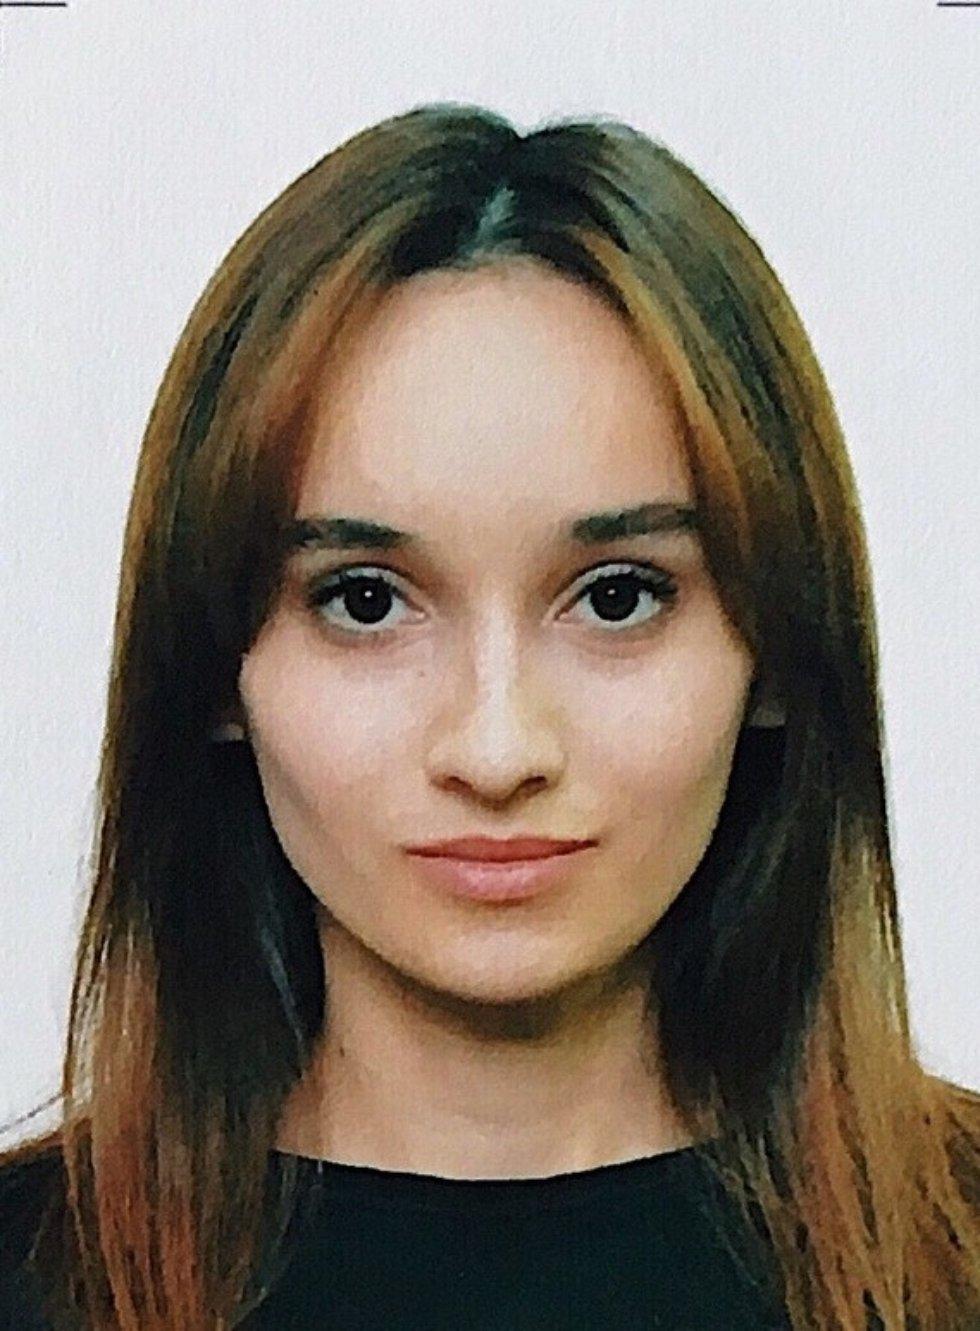 Белопухова Анна Андреевна